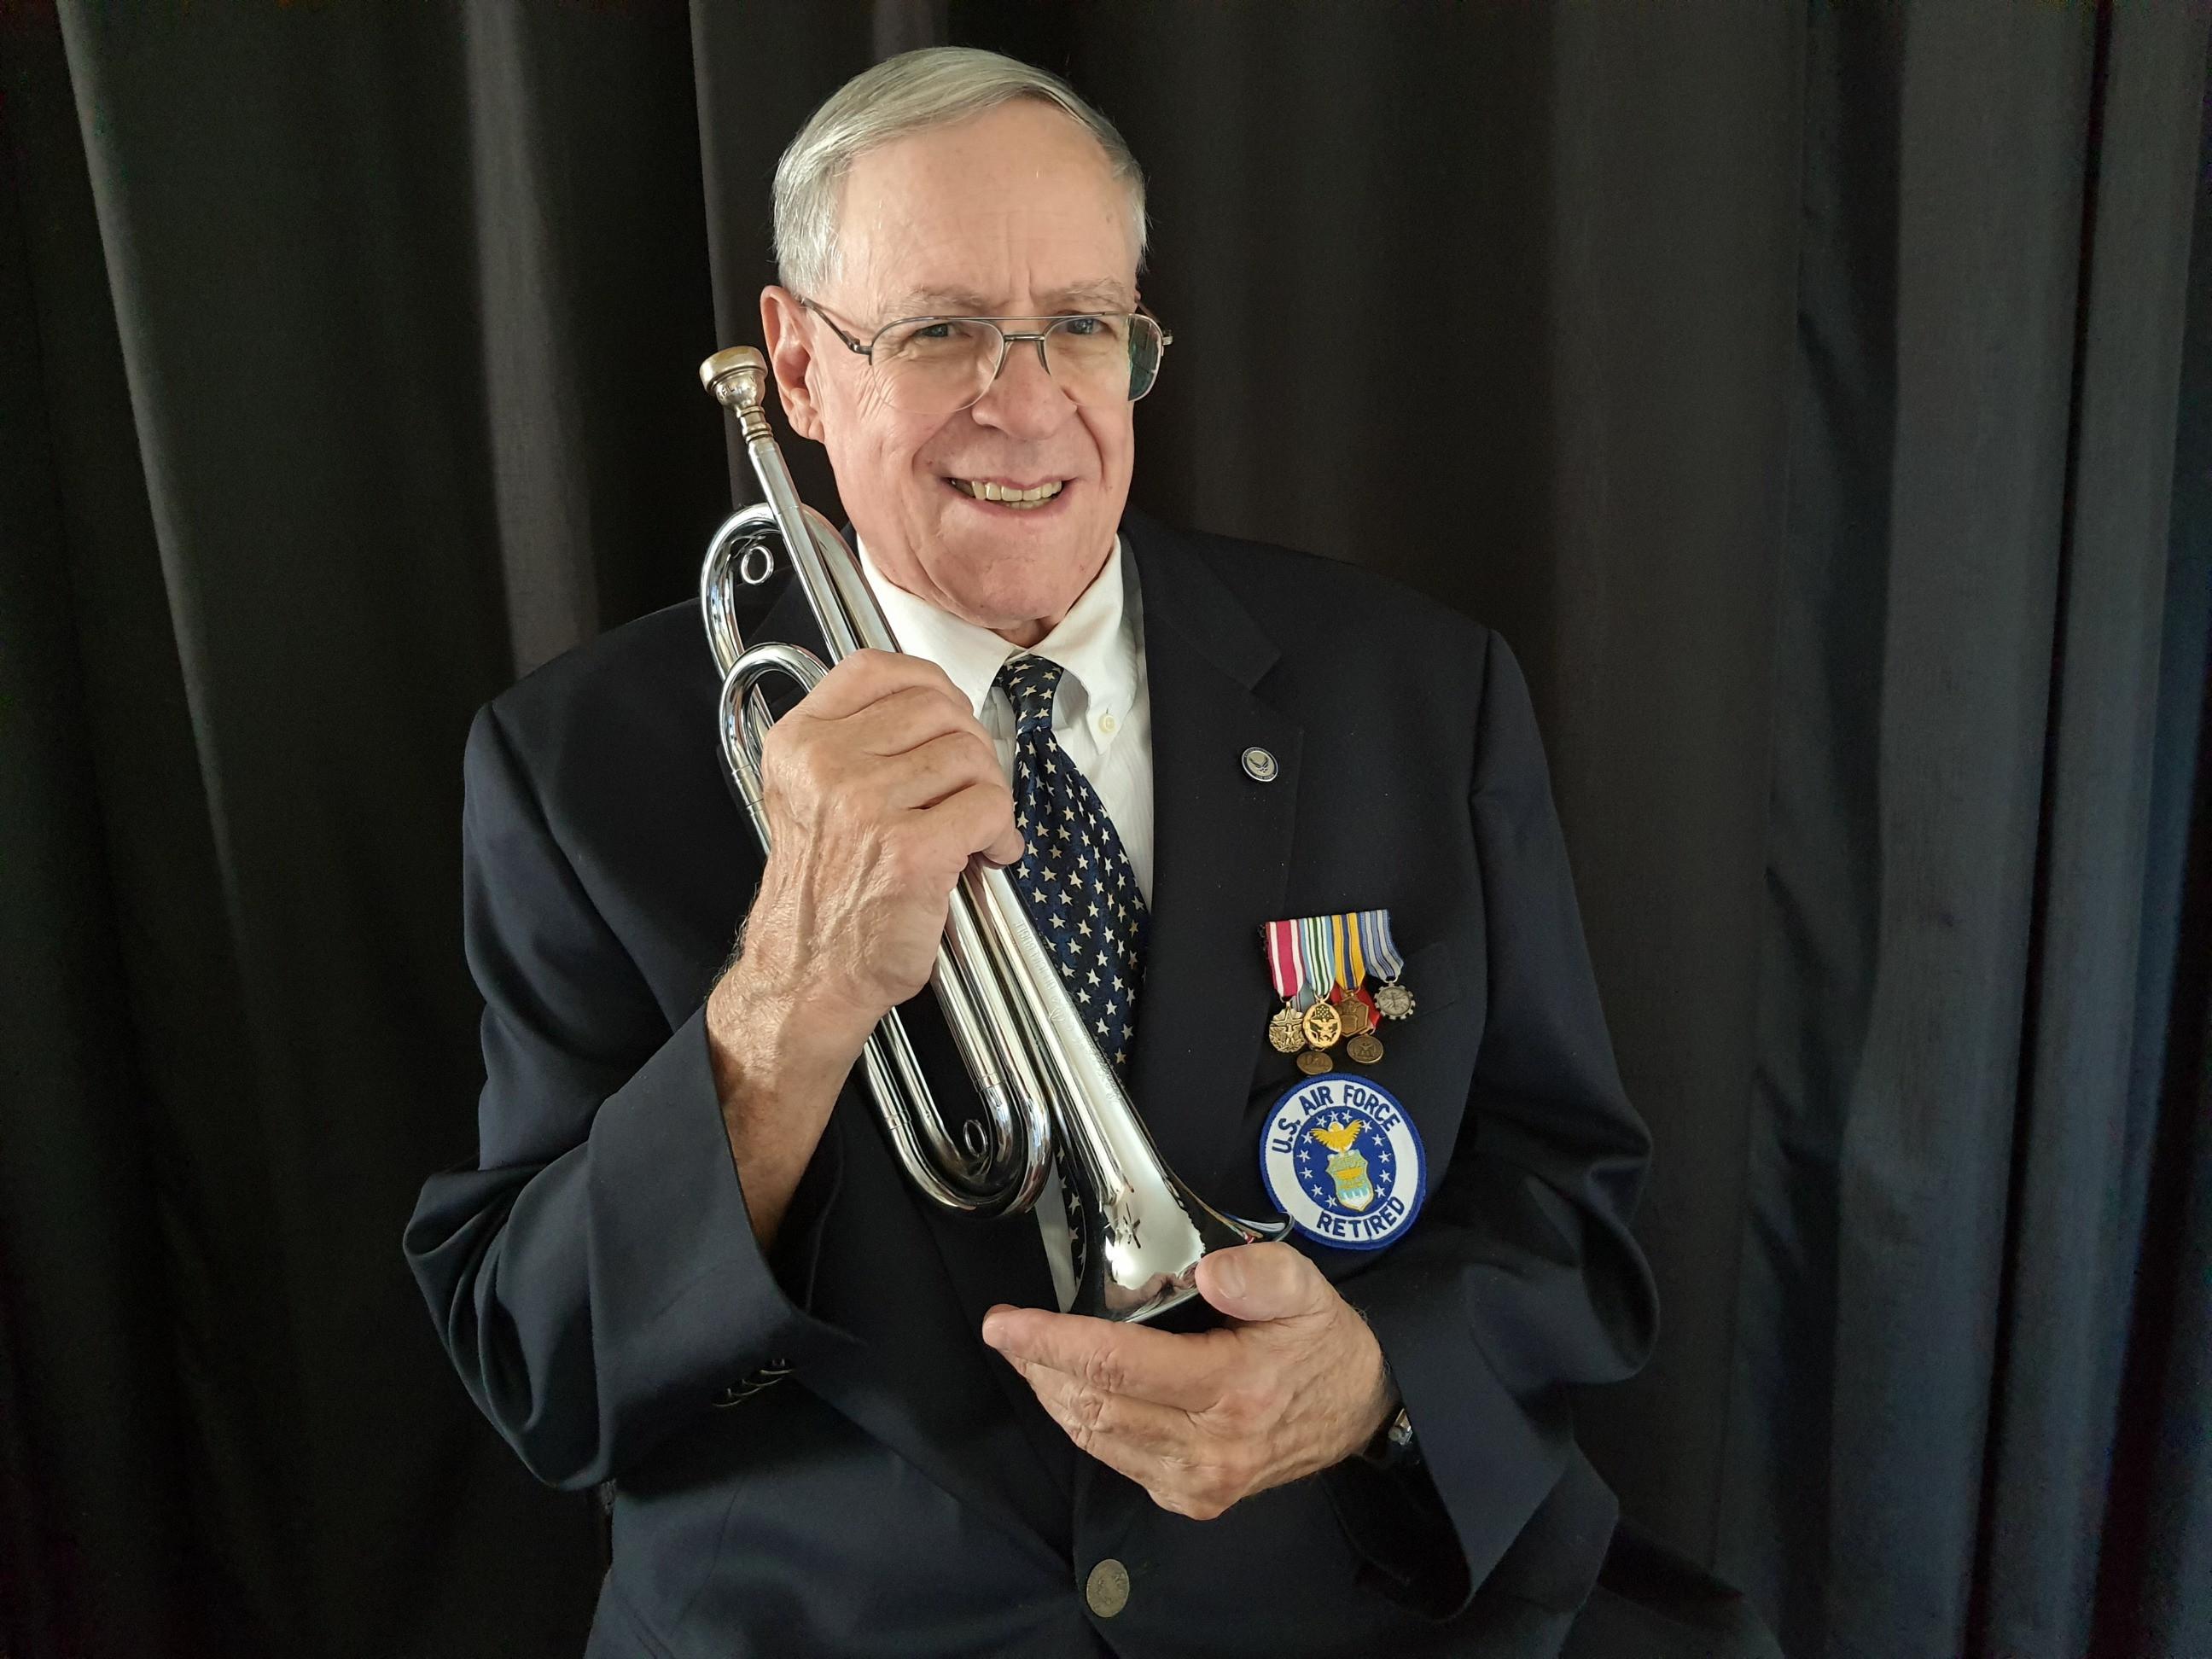 Veteran's Memorial Services